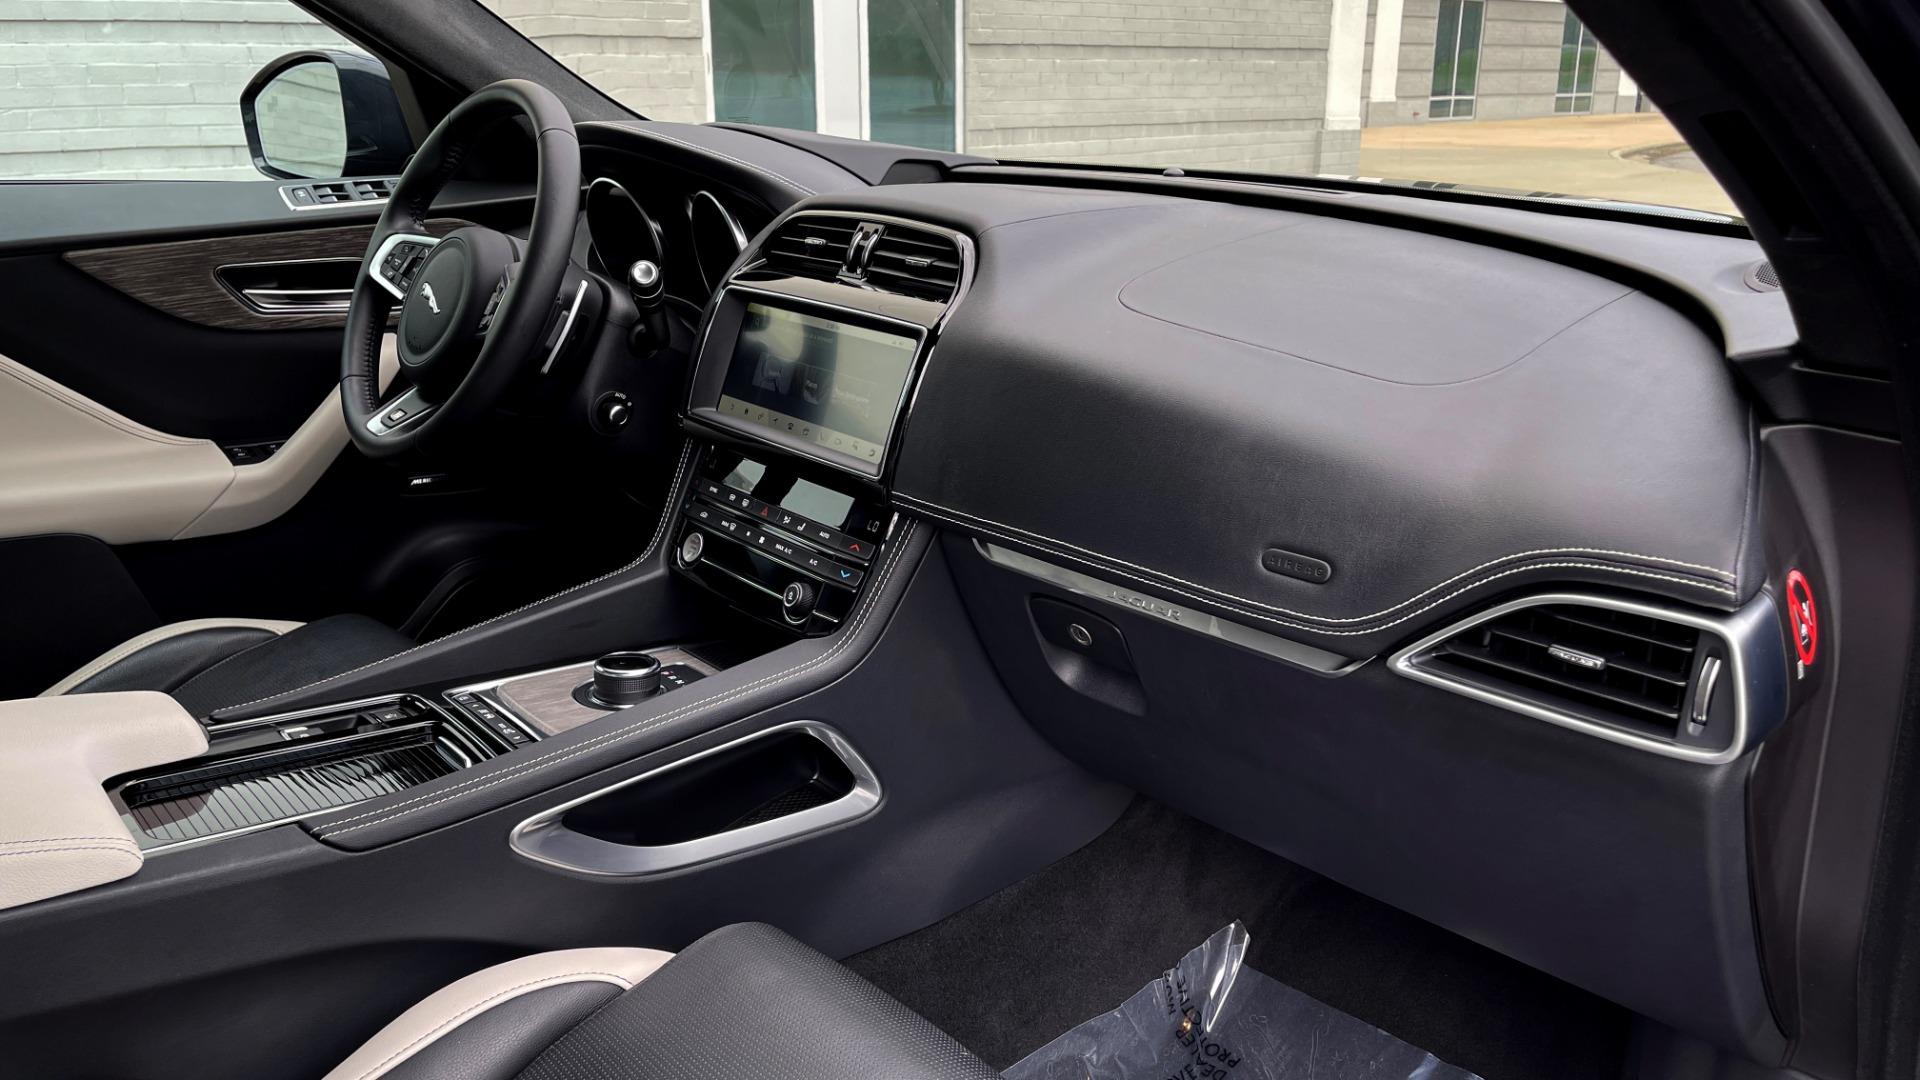 Used 2019 Jaguar F-PACE S / DRIVE PKG / BSA / HUD / BLACK EXT PKG / REARVIEW for sale $50,995 at Formula Imports in Charlotte NC 28227 64